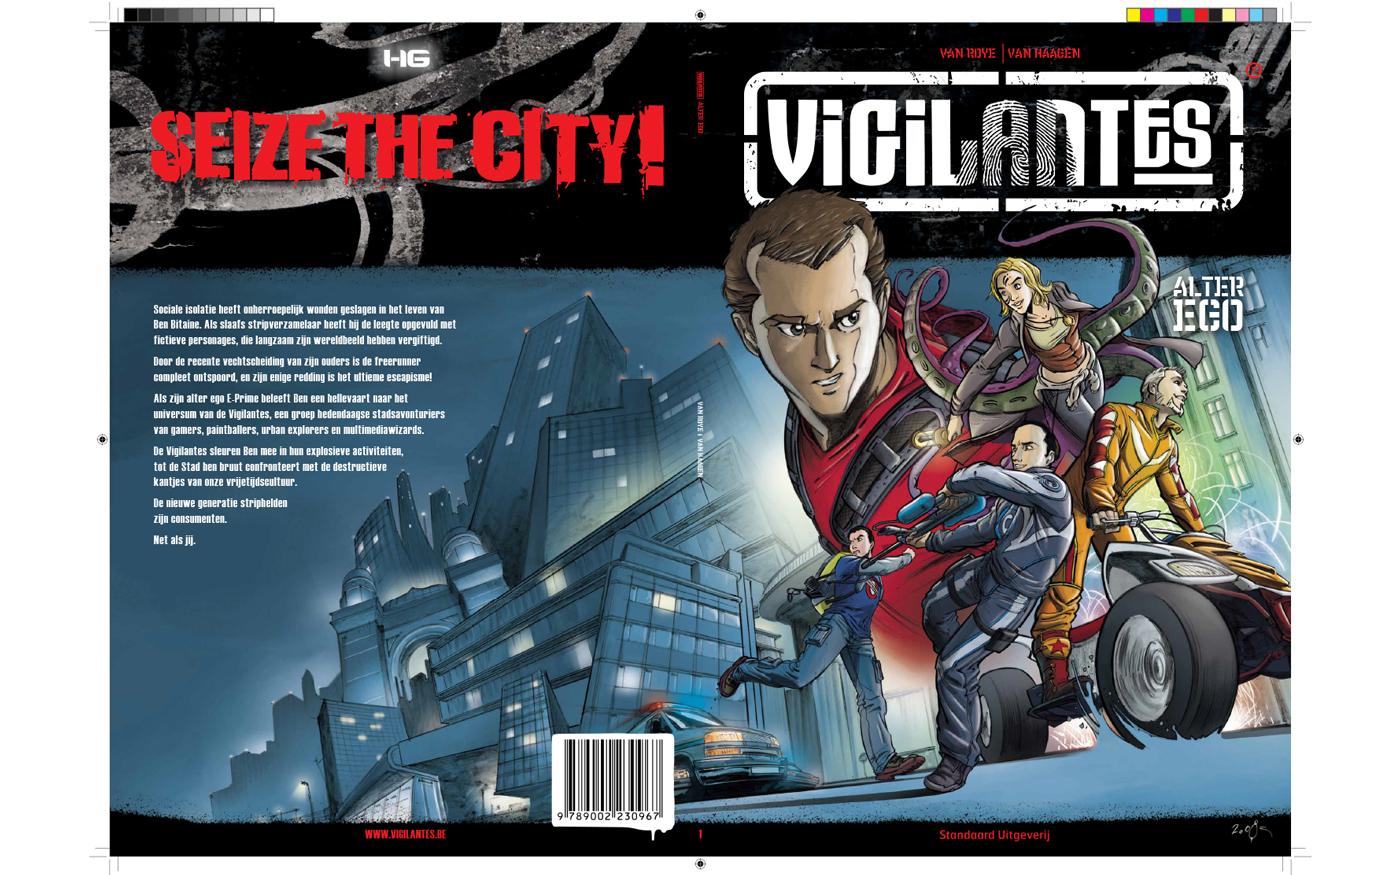 vigs_1400px_coverprint